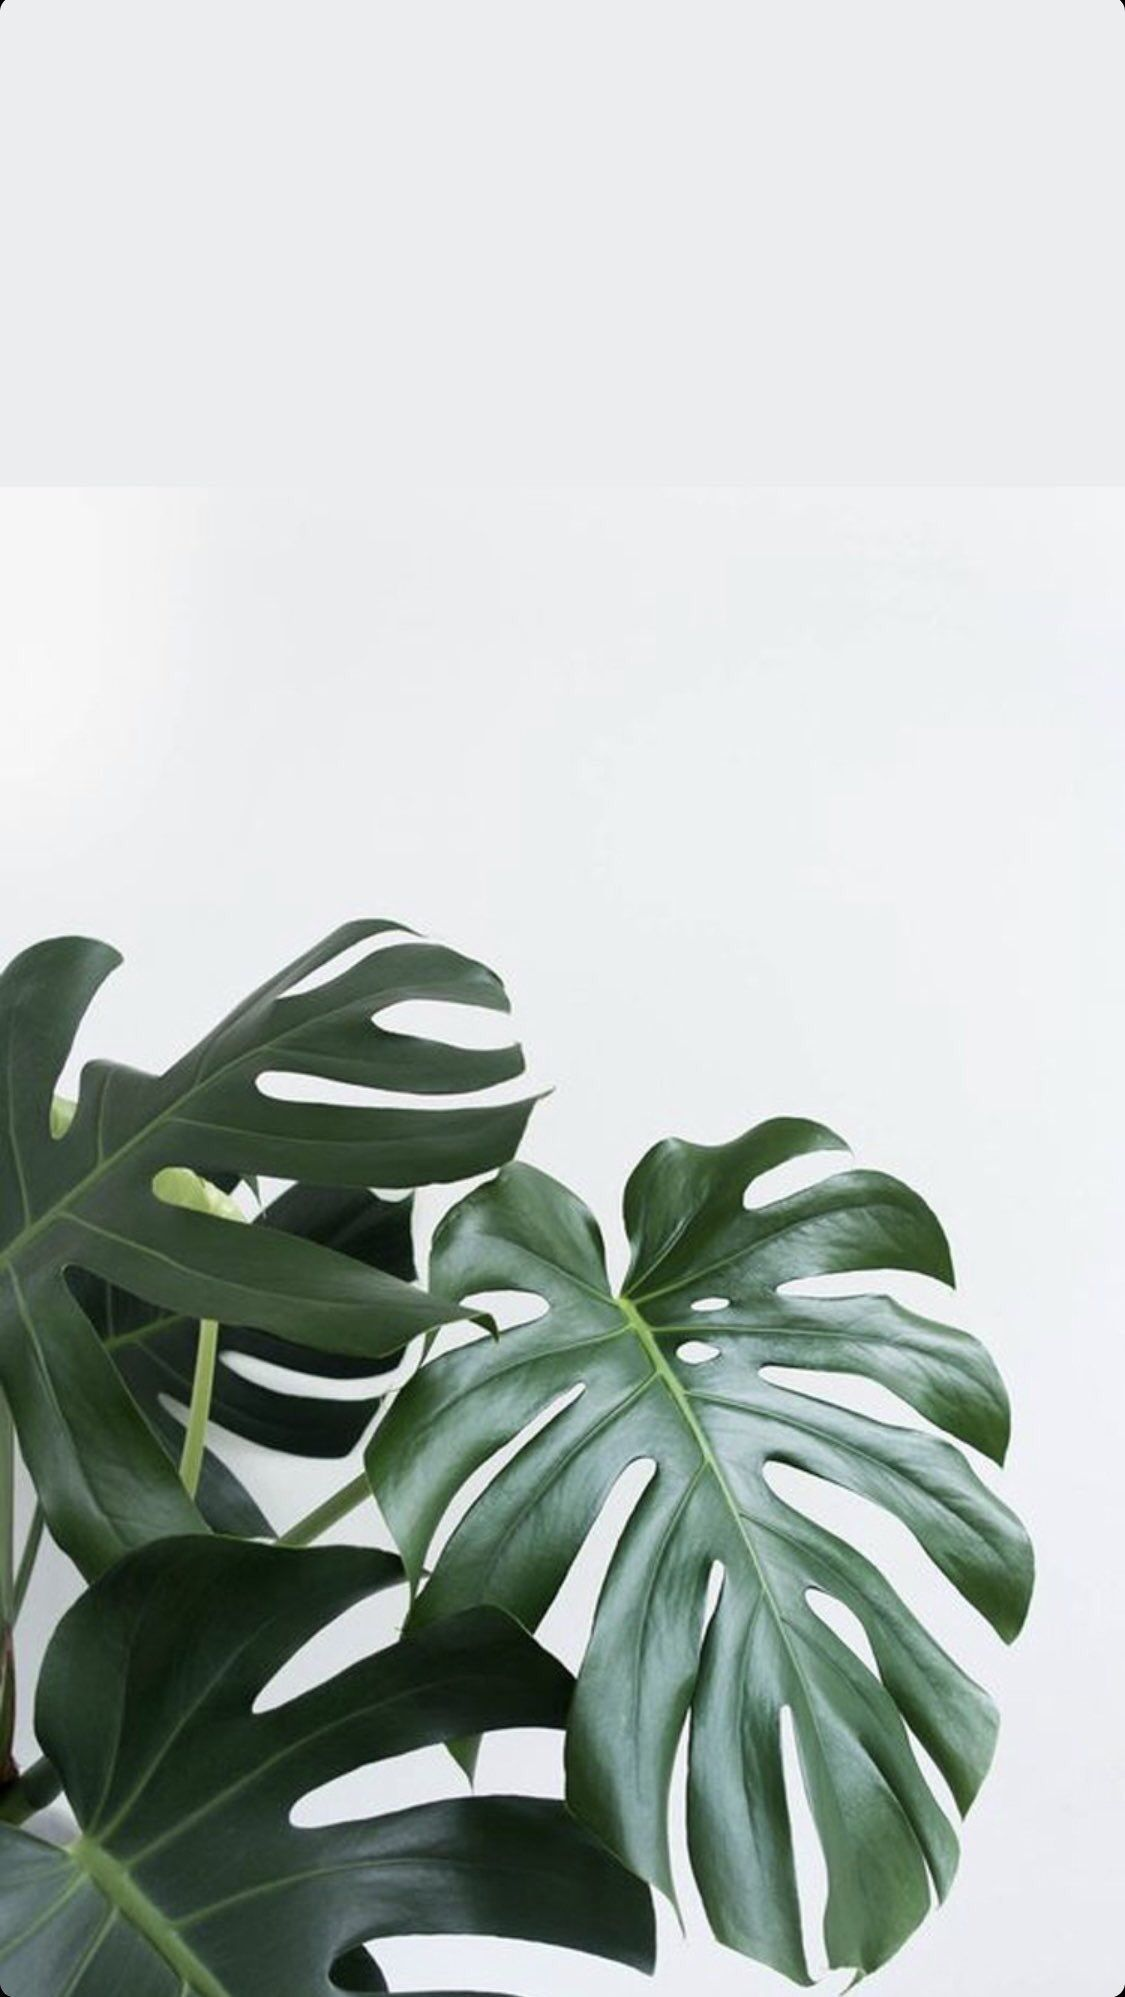 Garden Aesthetic -   12 plants Wallpaper leaves ideas